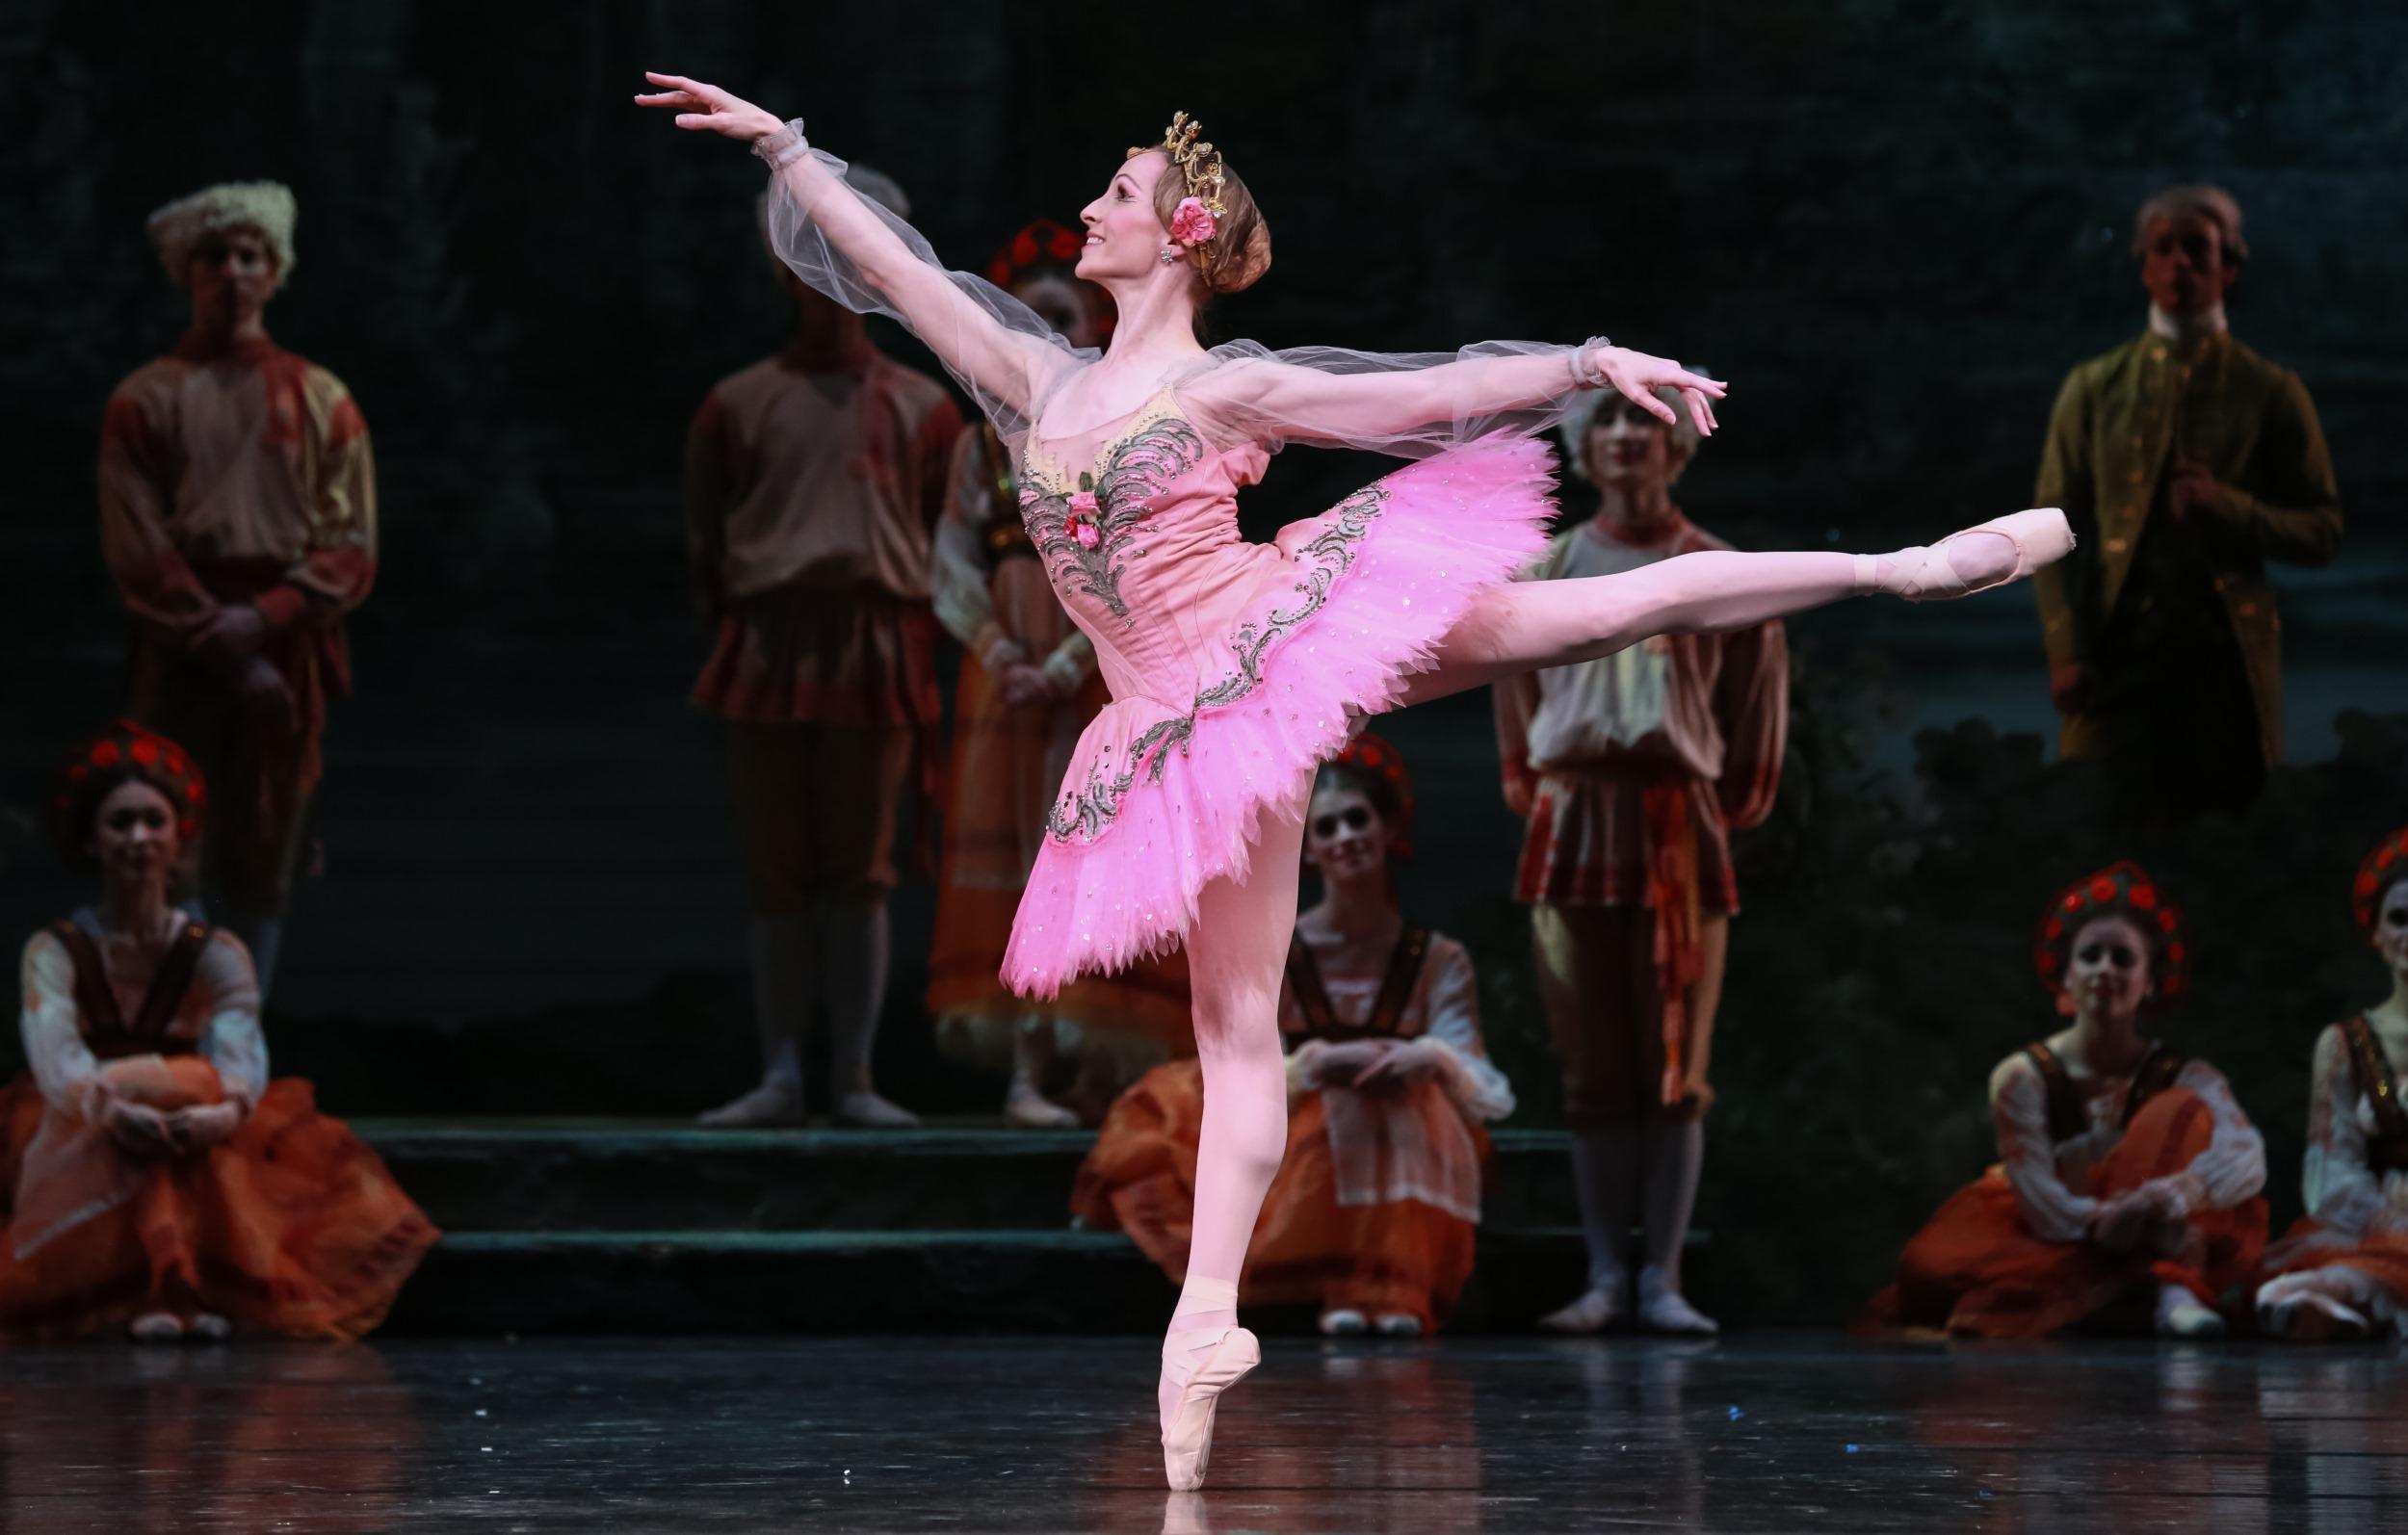 Sara Webb Bardo - performing professionally as principal ballerina for the Houston Ballet.